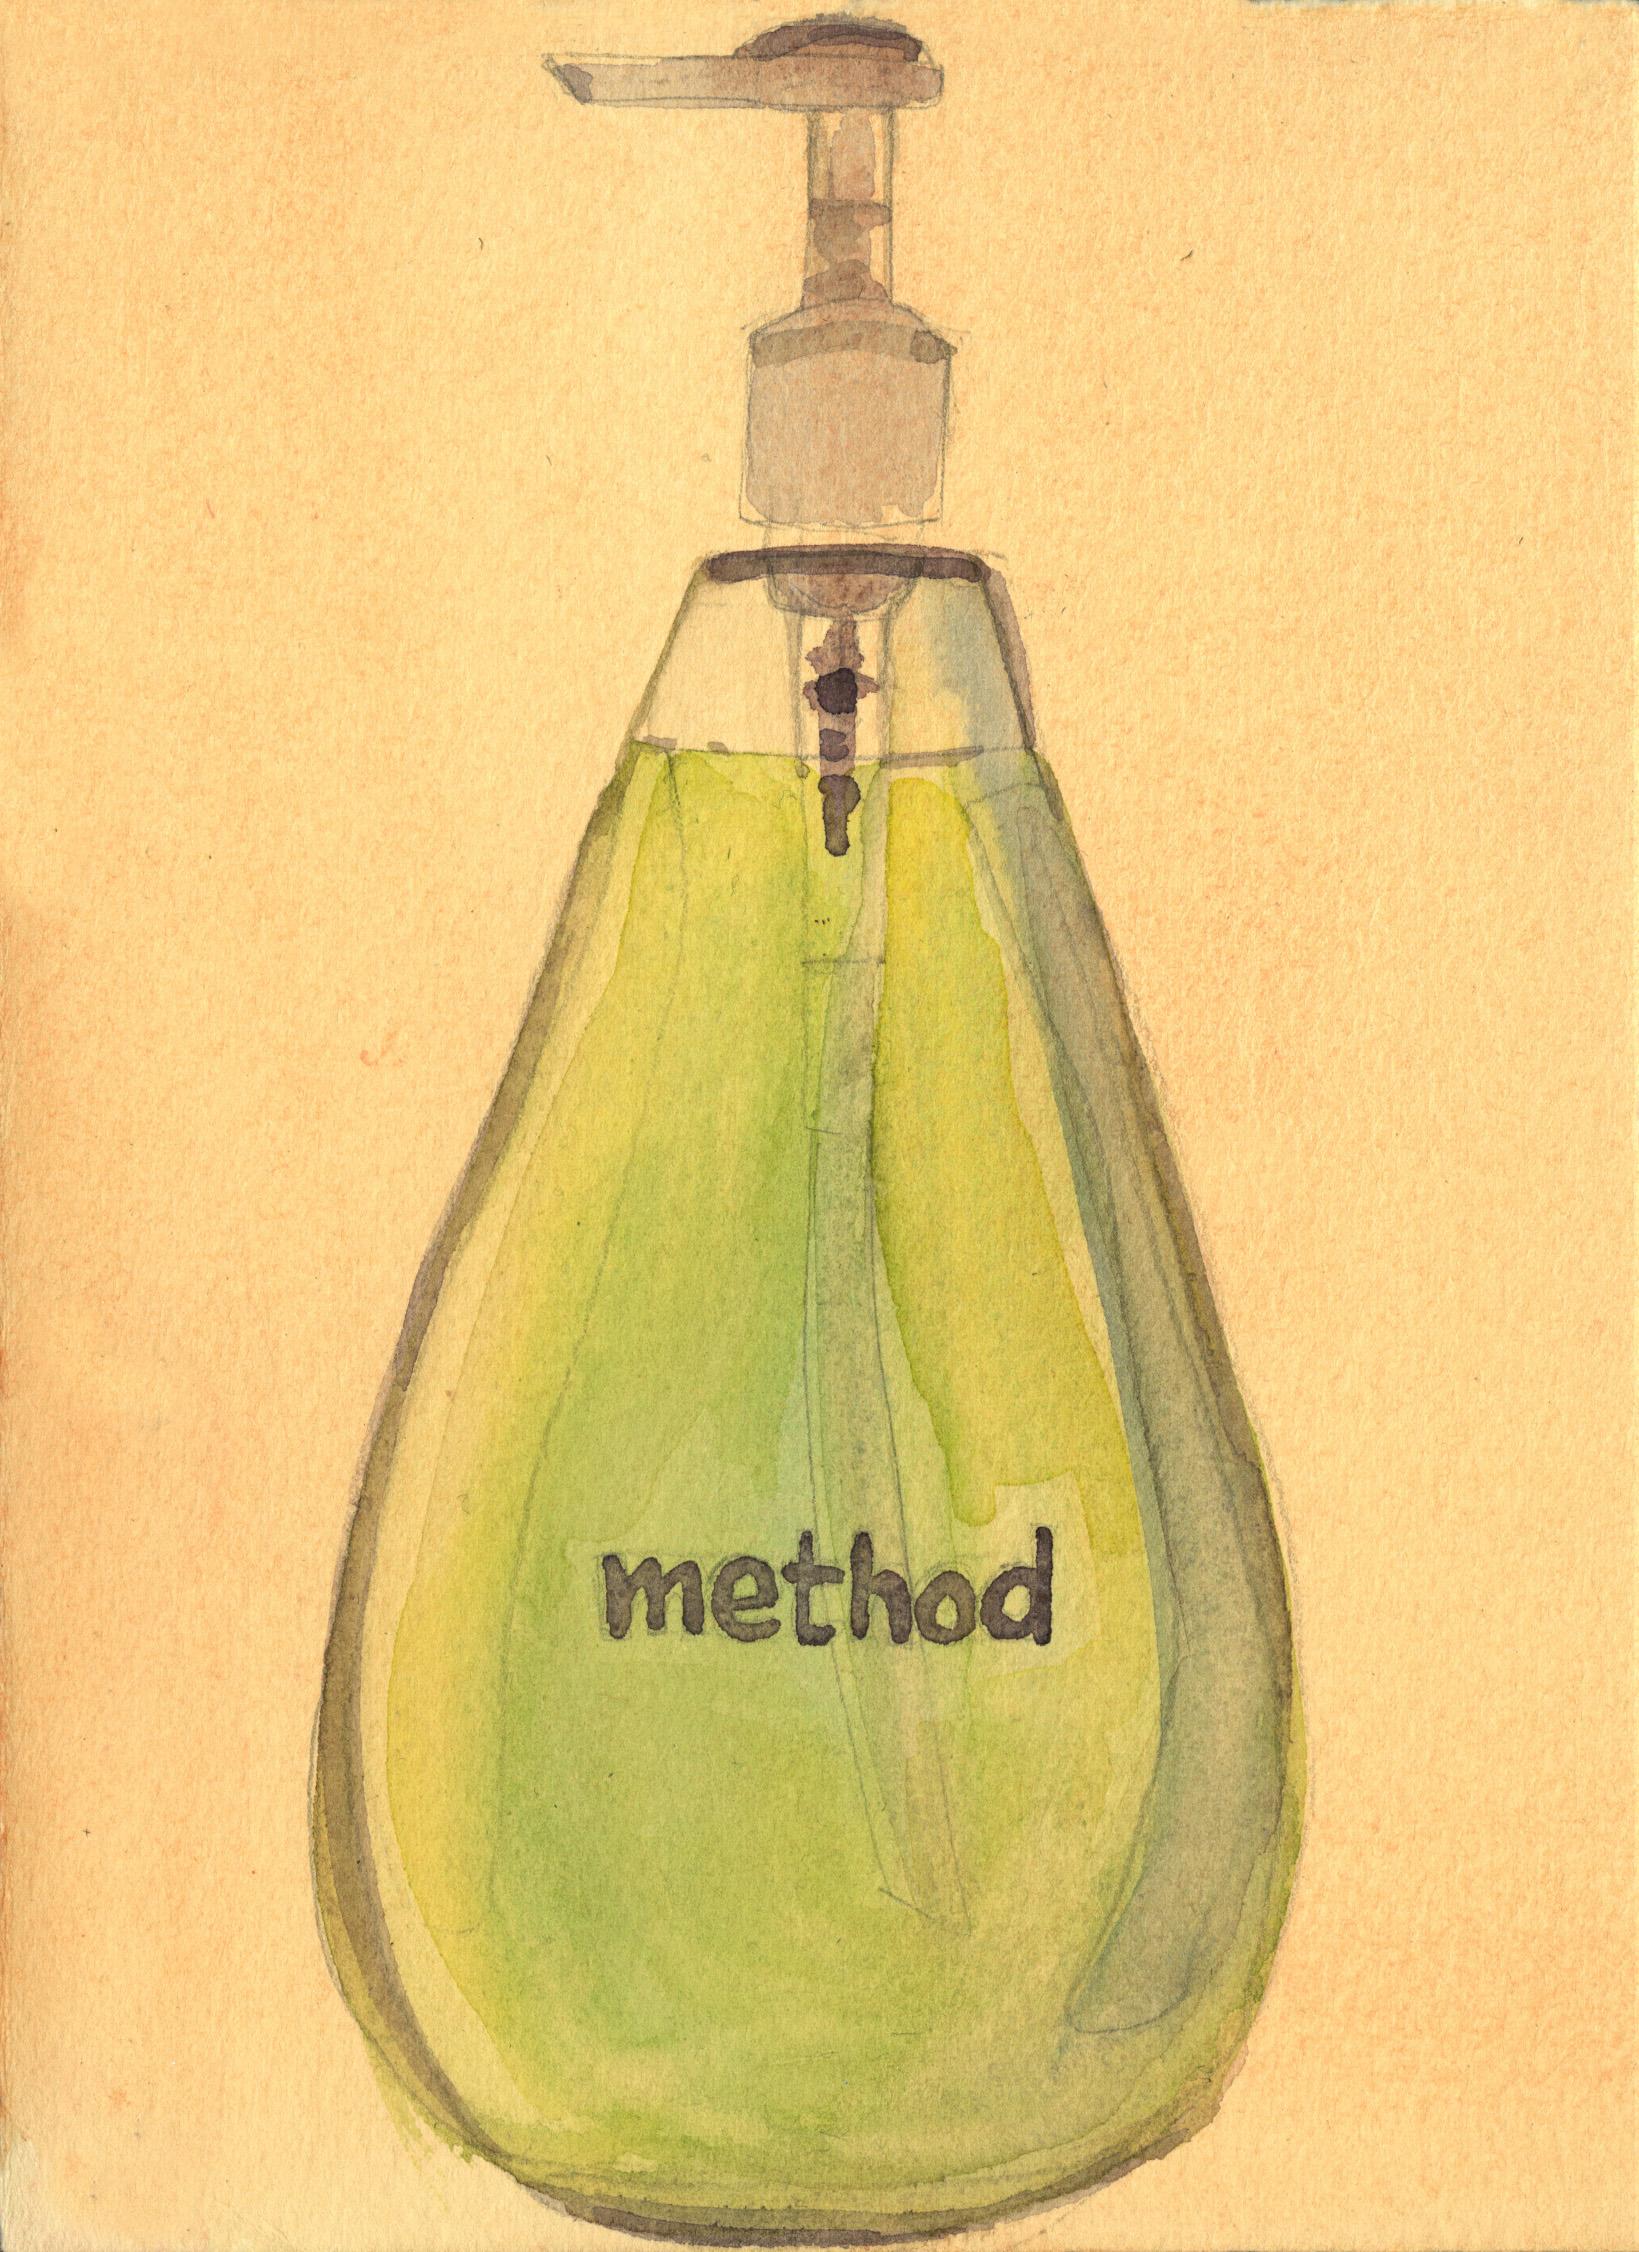 Method, 2014